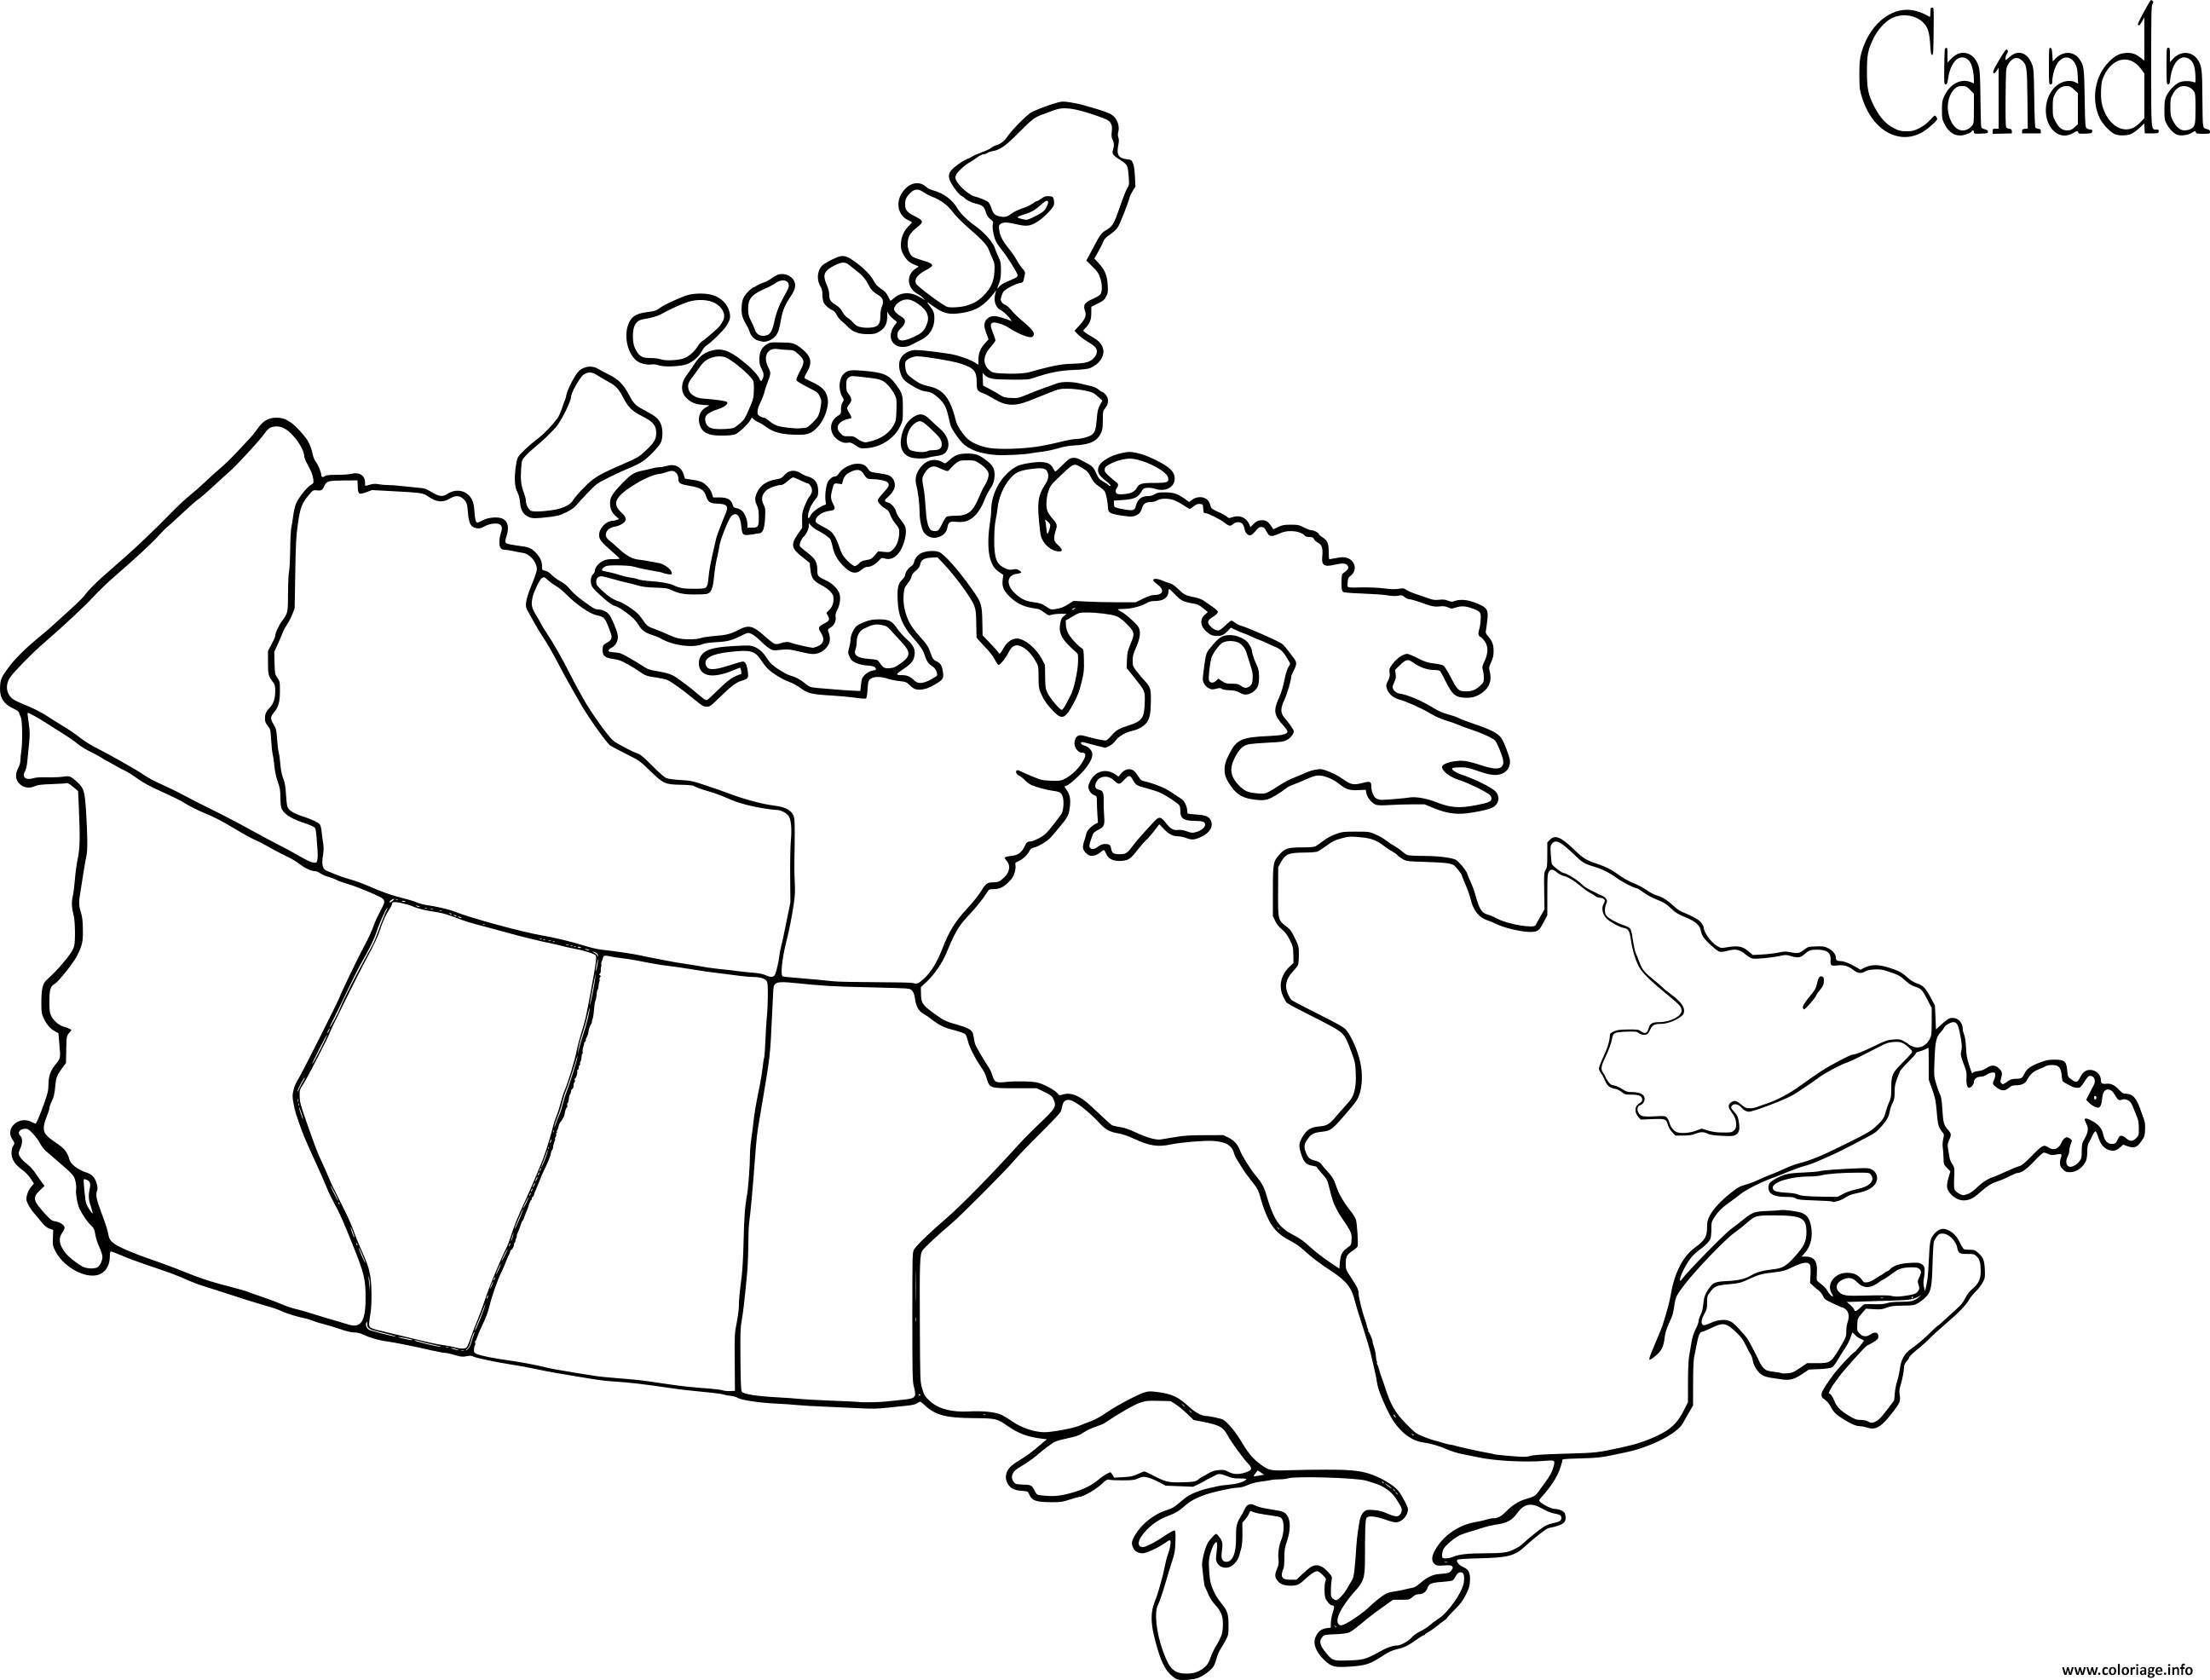 Dessin carte du canada Coloriage Gratuit à Imprimer